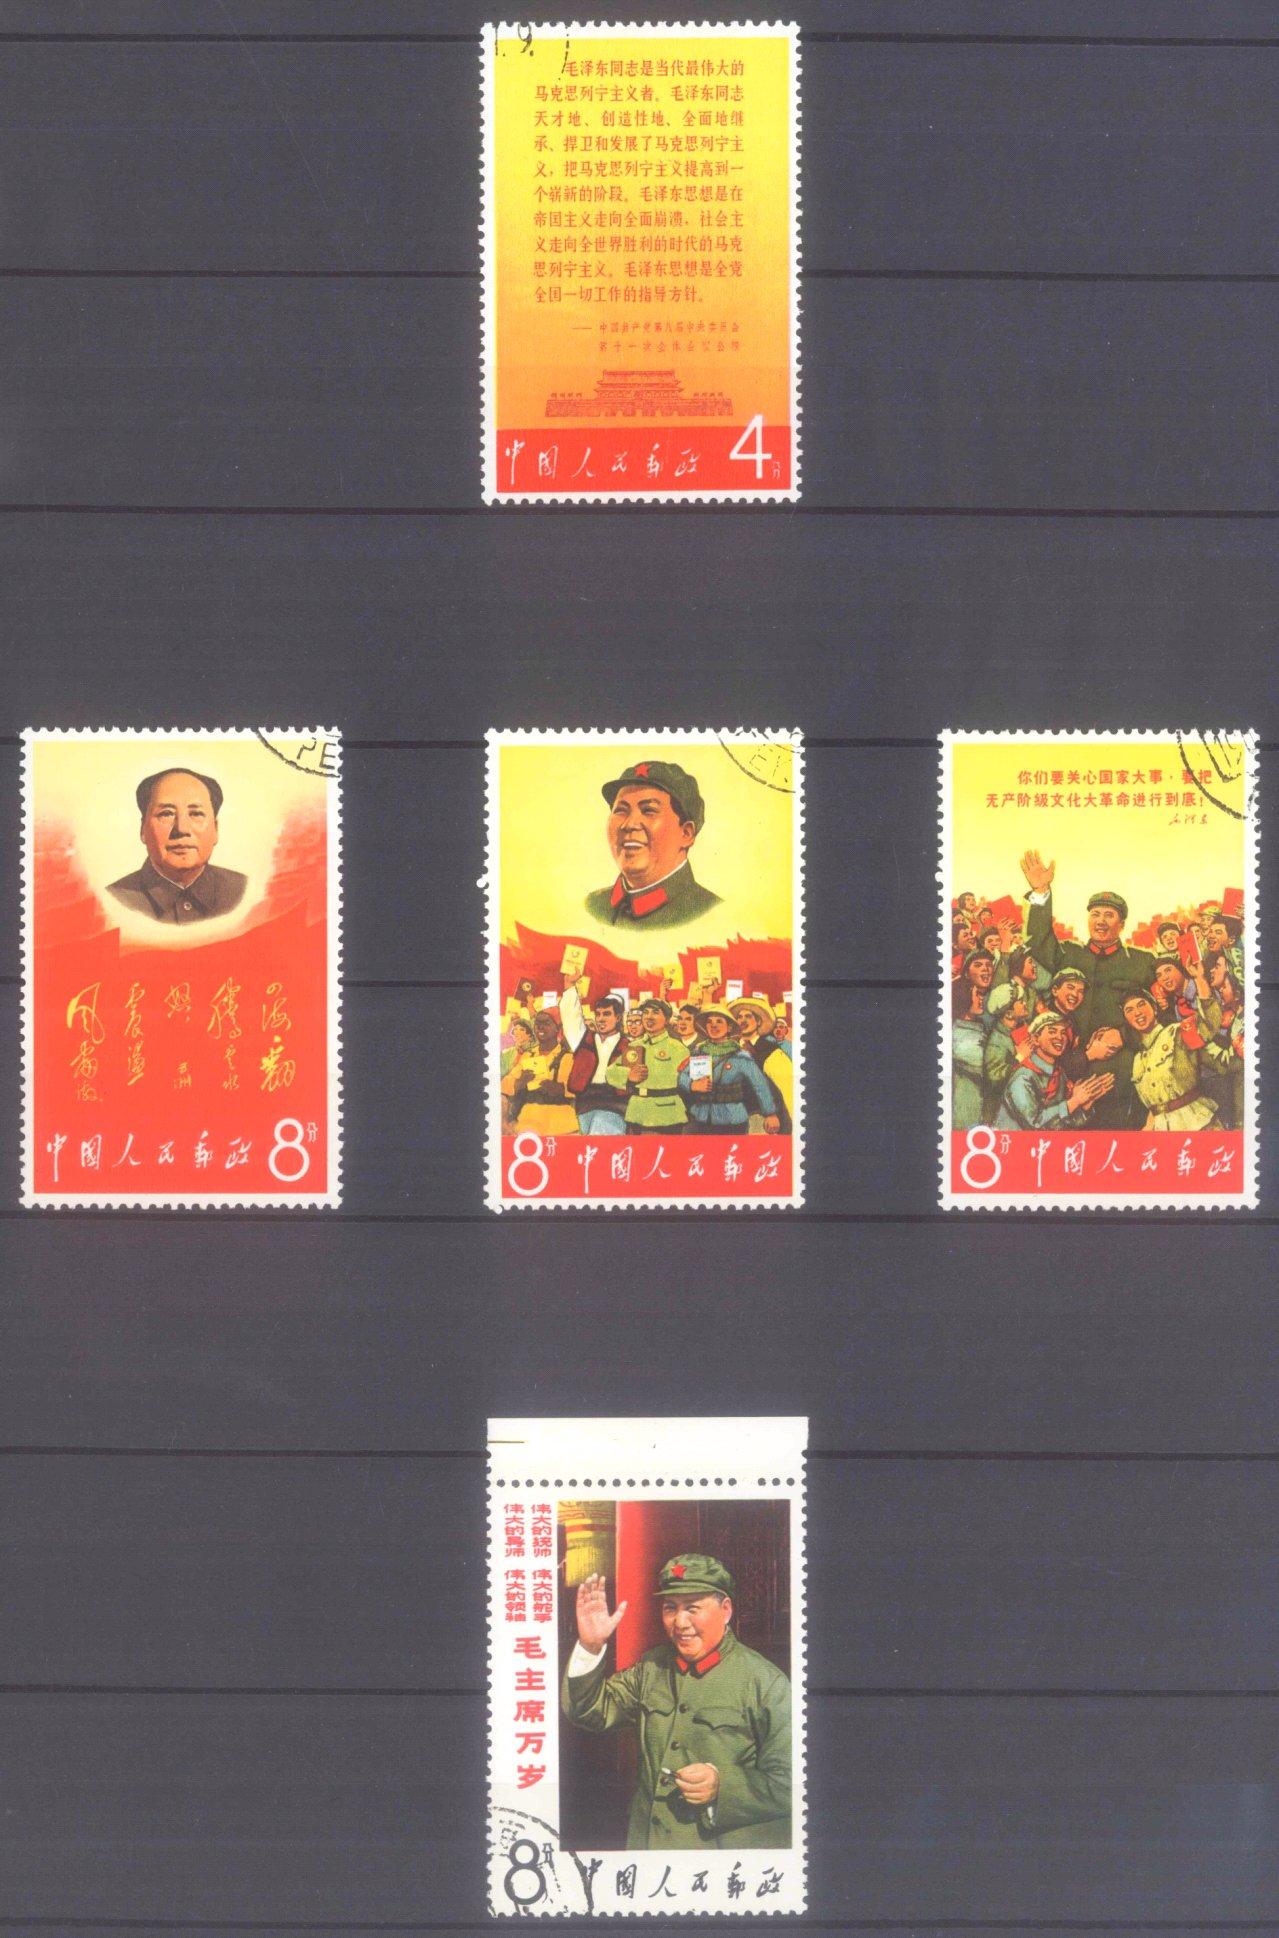 VOLKSREPUBLIK CHINA 1967, Thesen Mao Zedongs